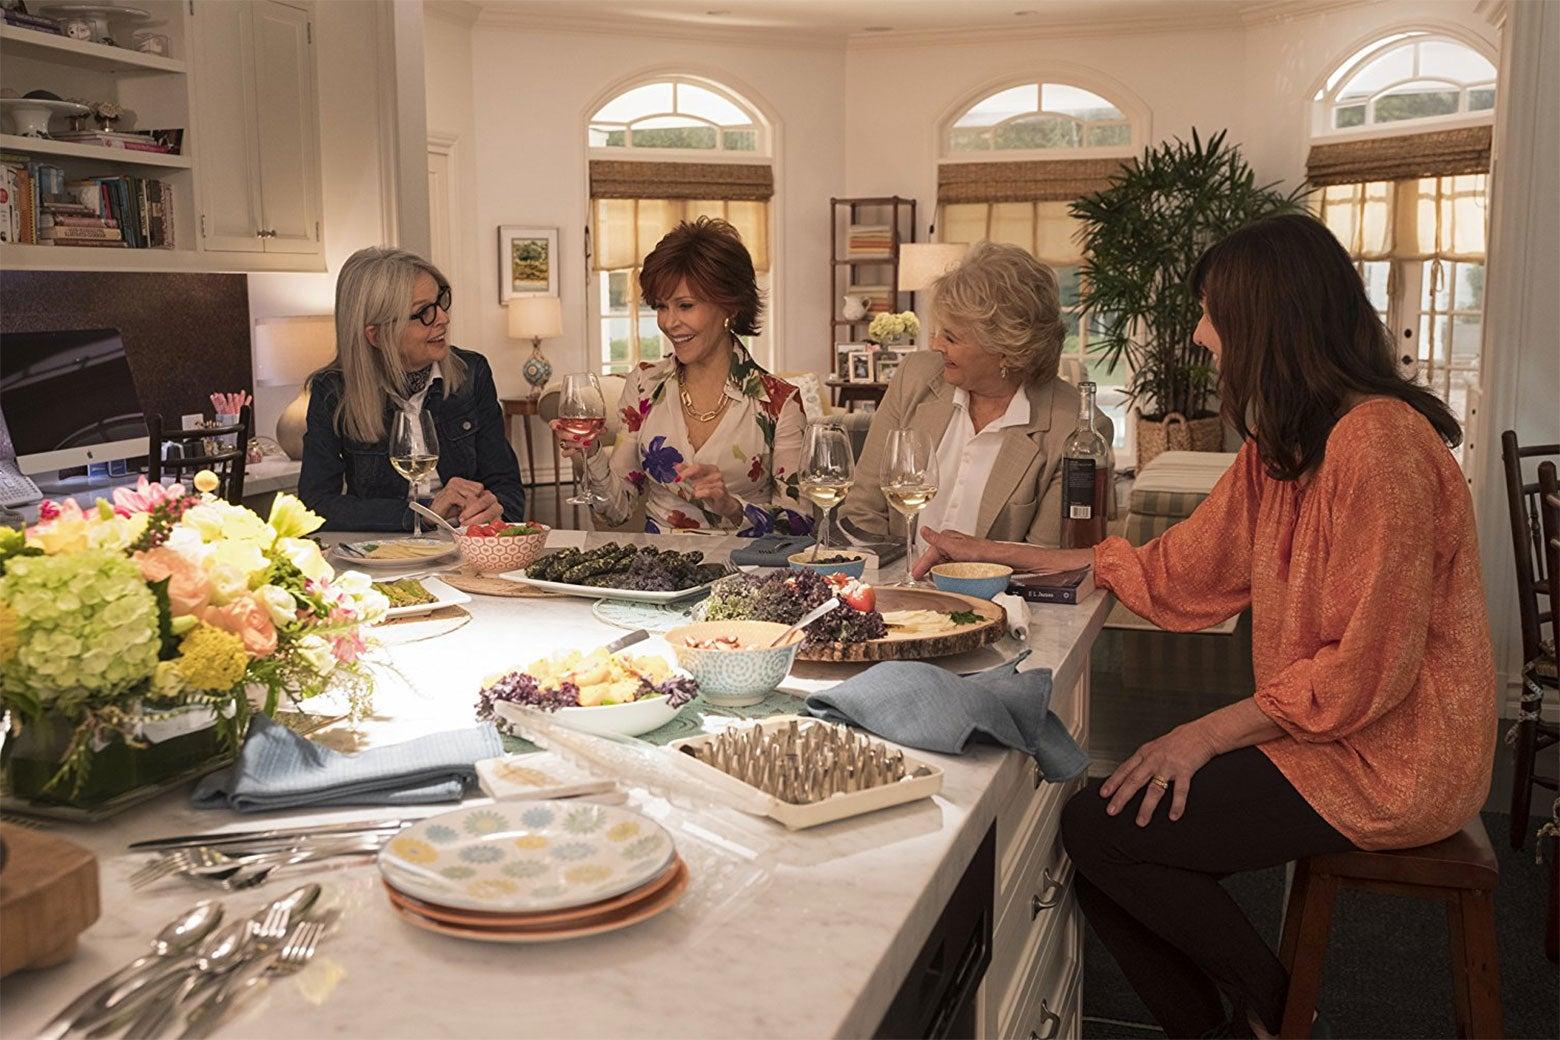 Candice Bergen, Jane Fonda, Diane Keaton, and Mary Steenburgen in the movie Book Club.